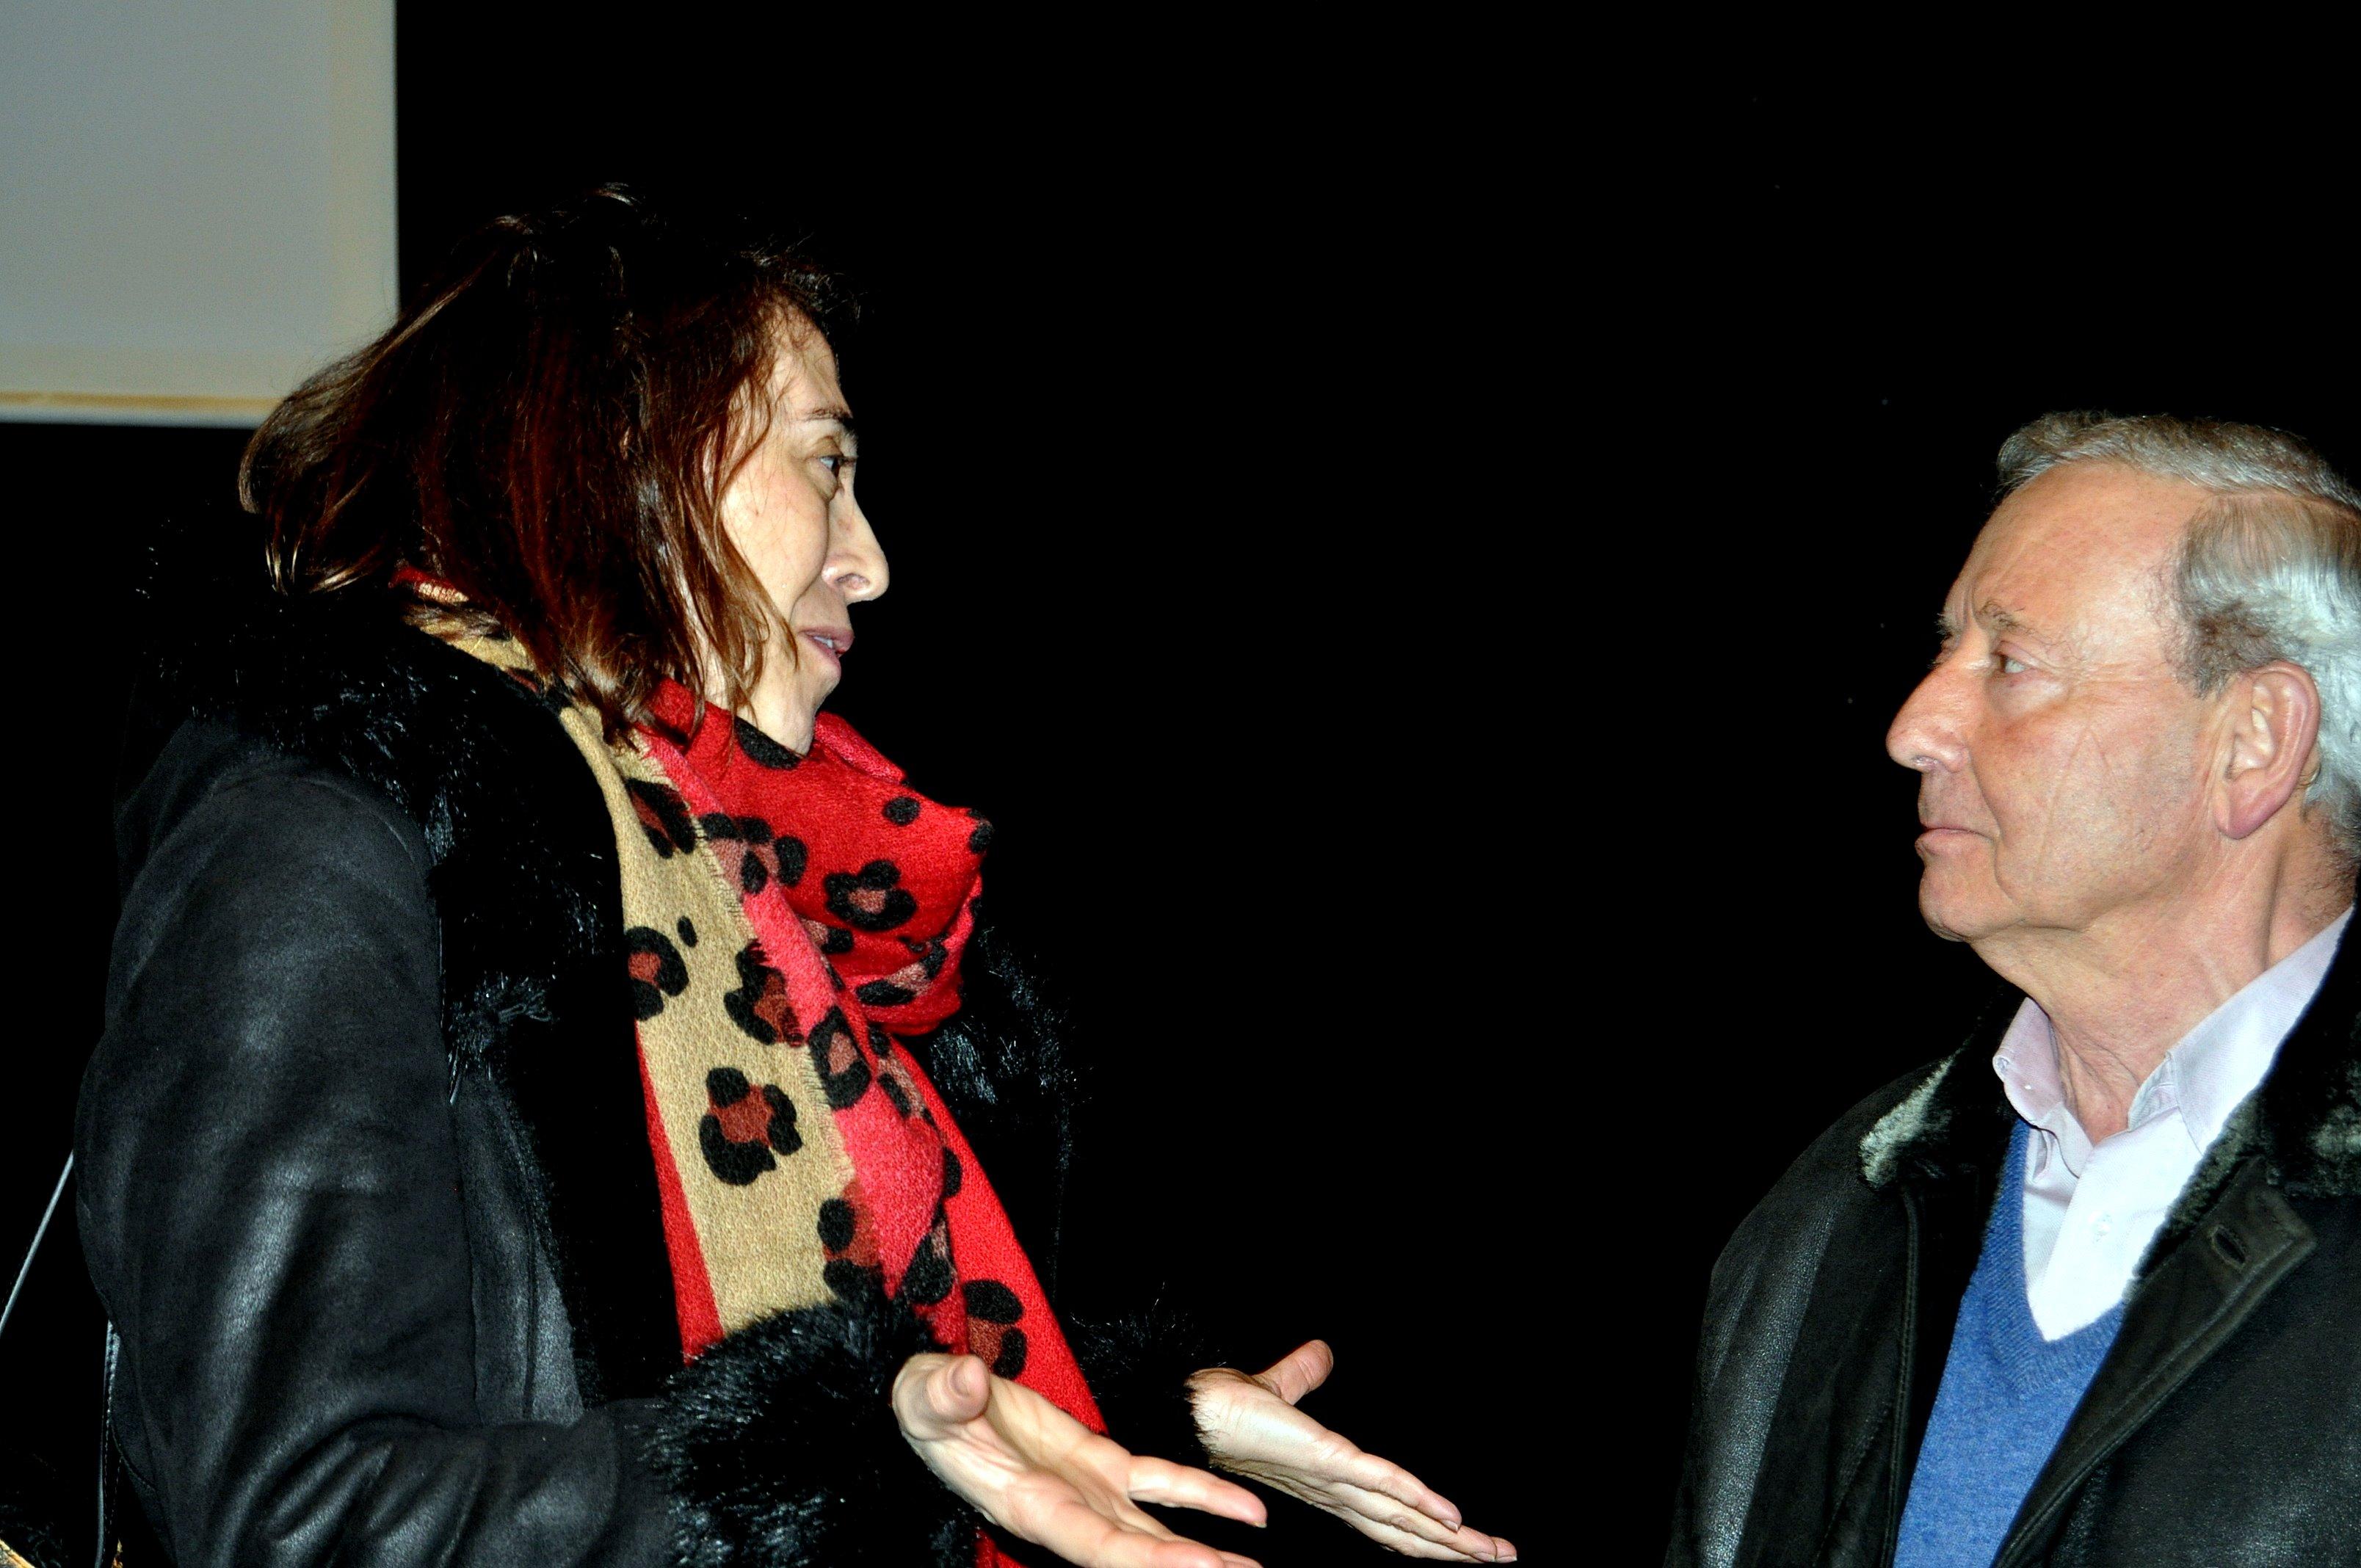 La profesora Irune Fiz con el presidente de Promonumentas. Marcelino Fernández.